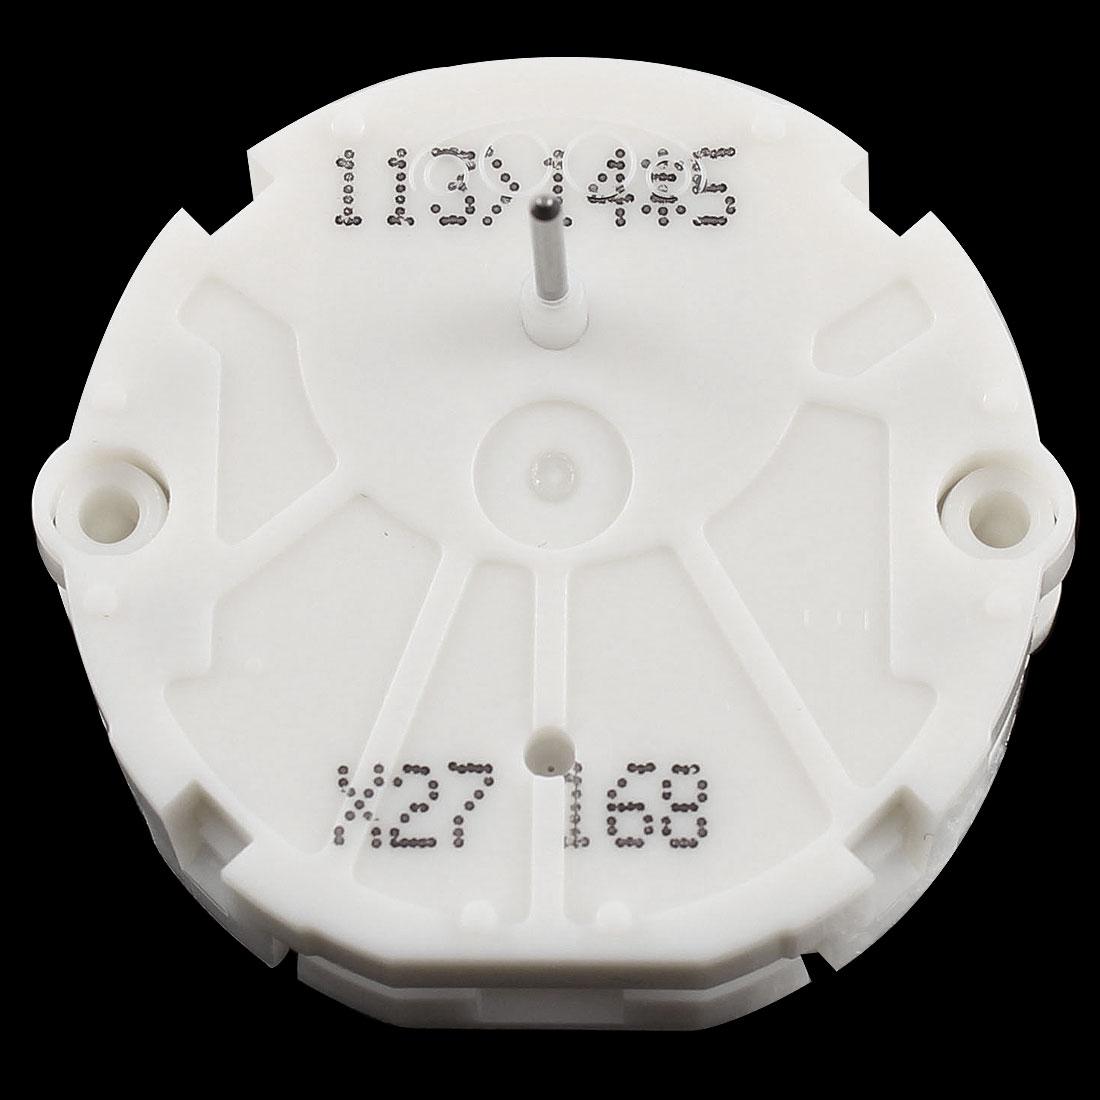 6 GM GMC X27 168 Stepper Motor Speedometer Gauge Repair ...